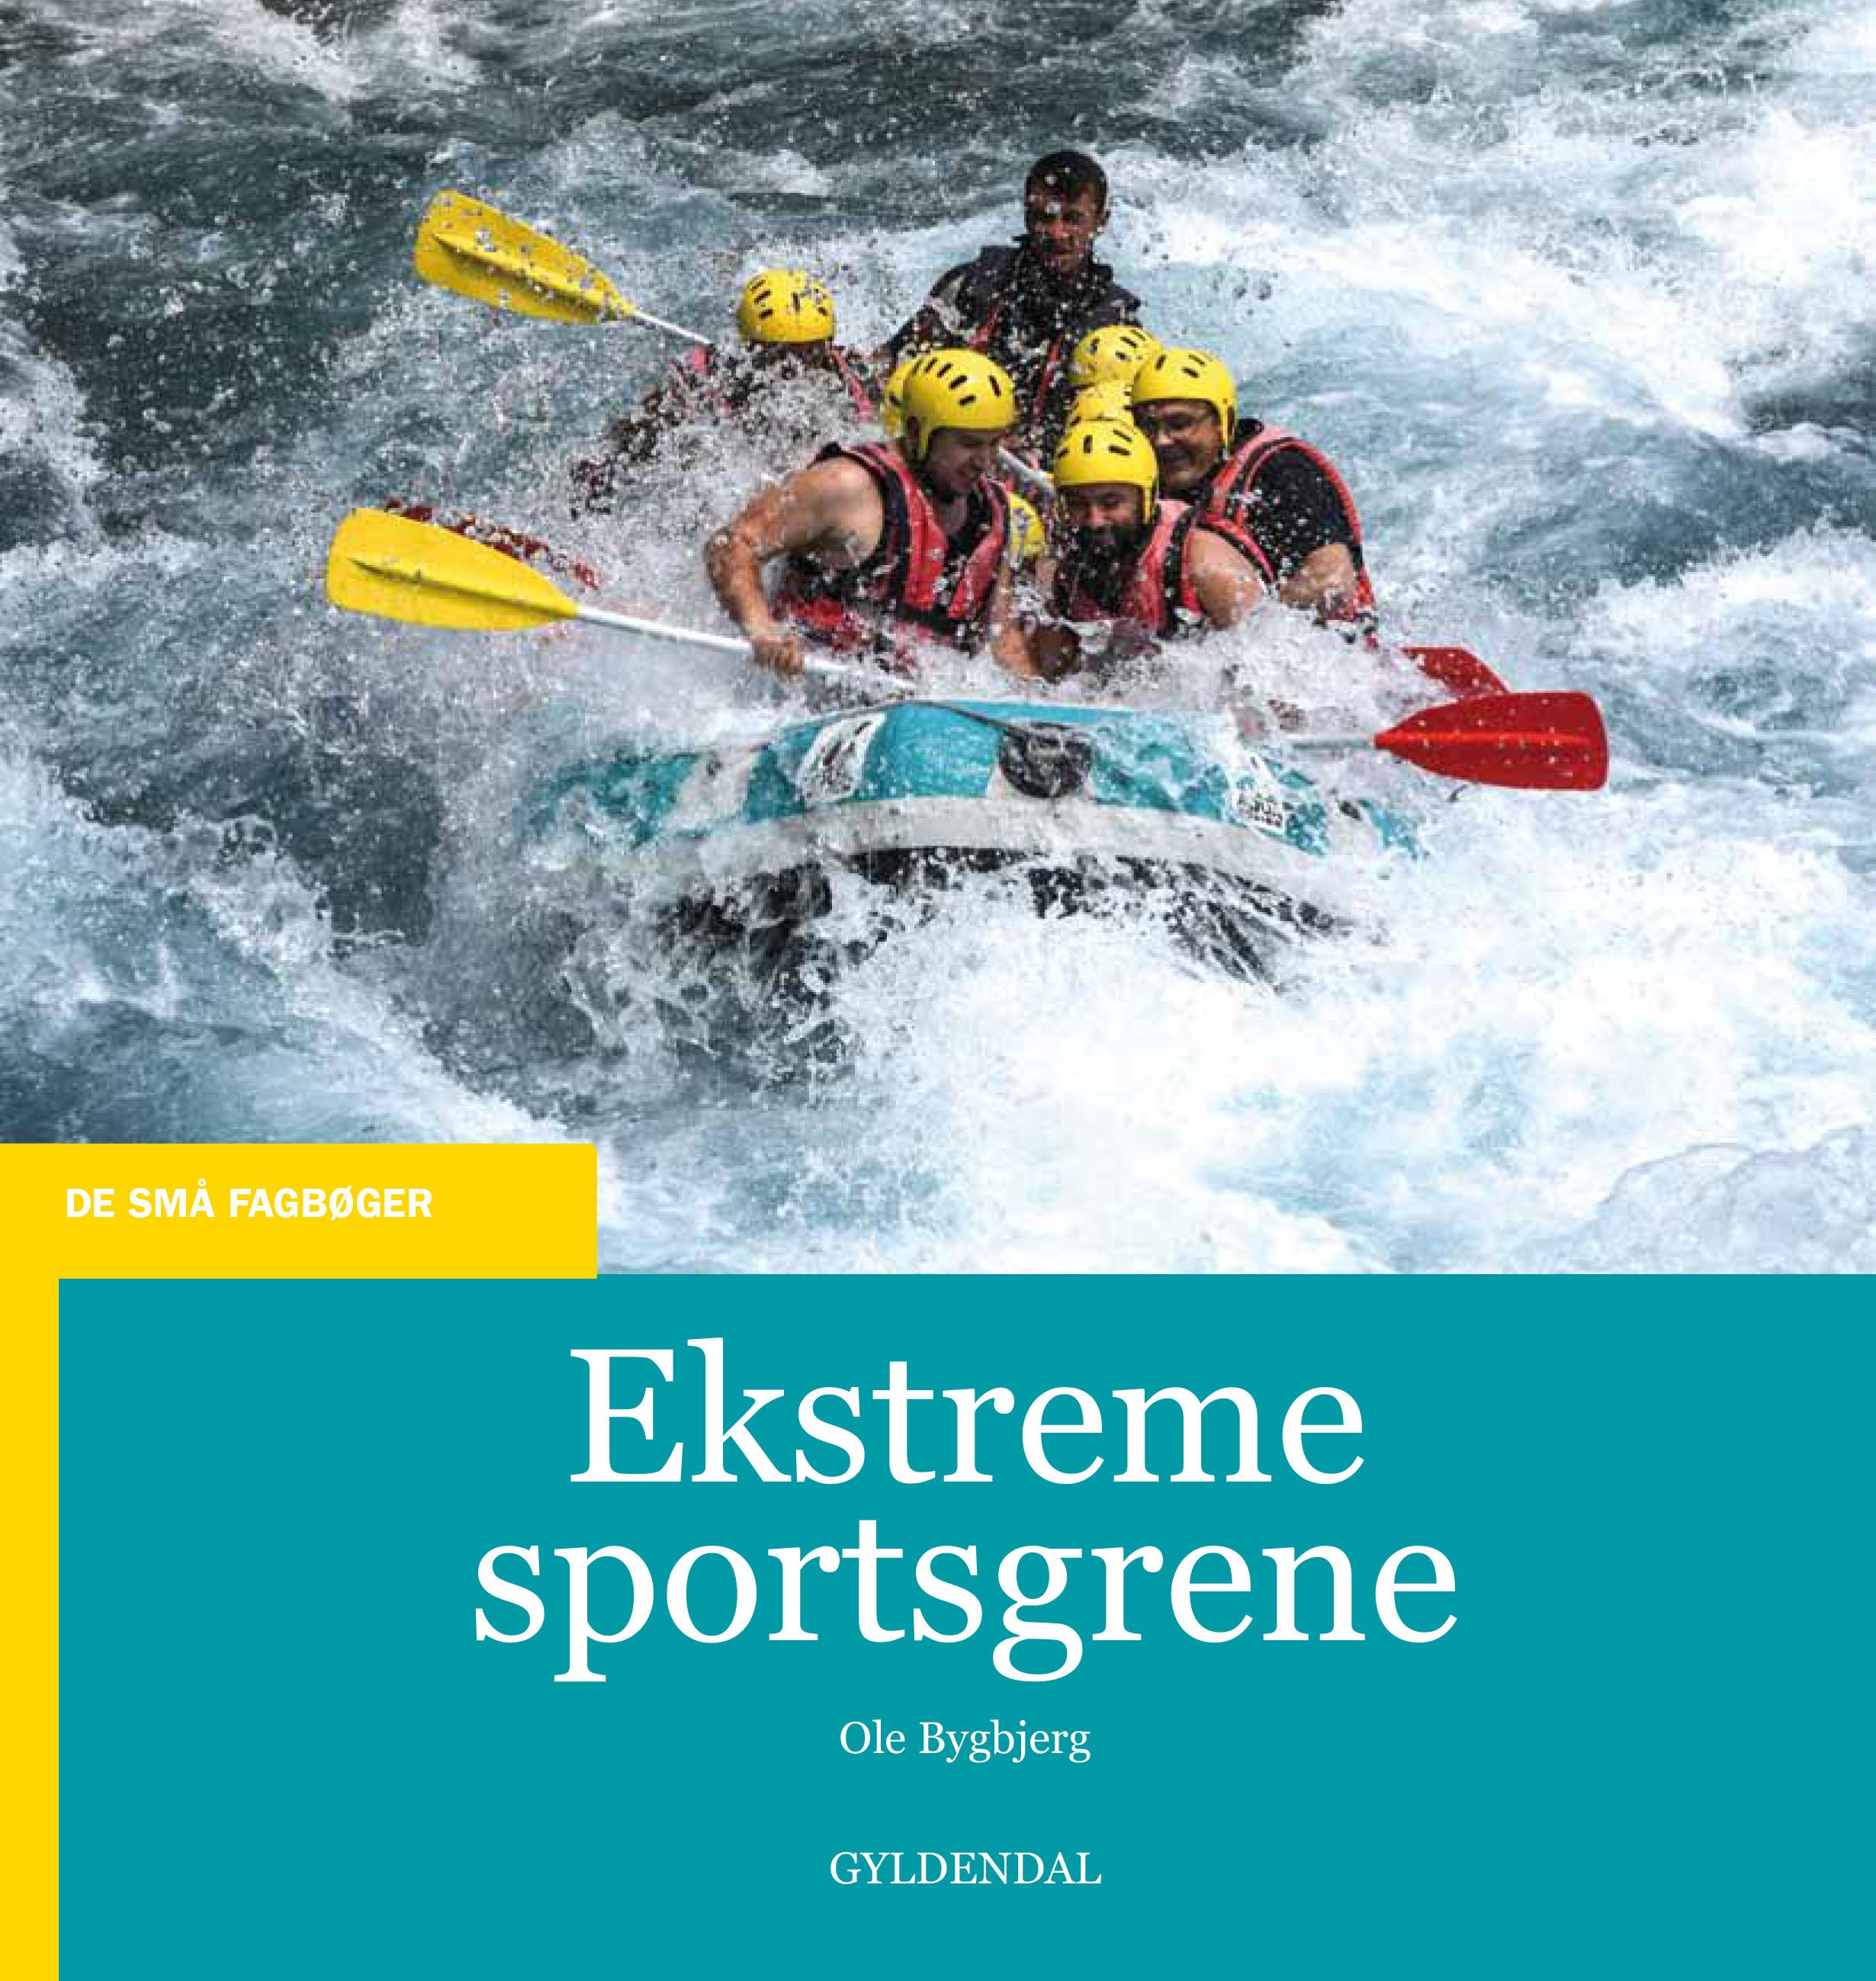 De små fagbøger: Ekstreme sportsgrene - Ole Bygbjerg - Bøger - Gyldendal - 9788702307788 - 2/7-2020